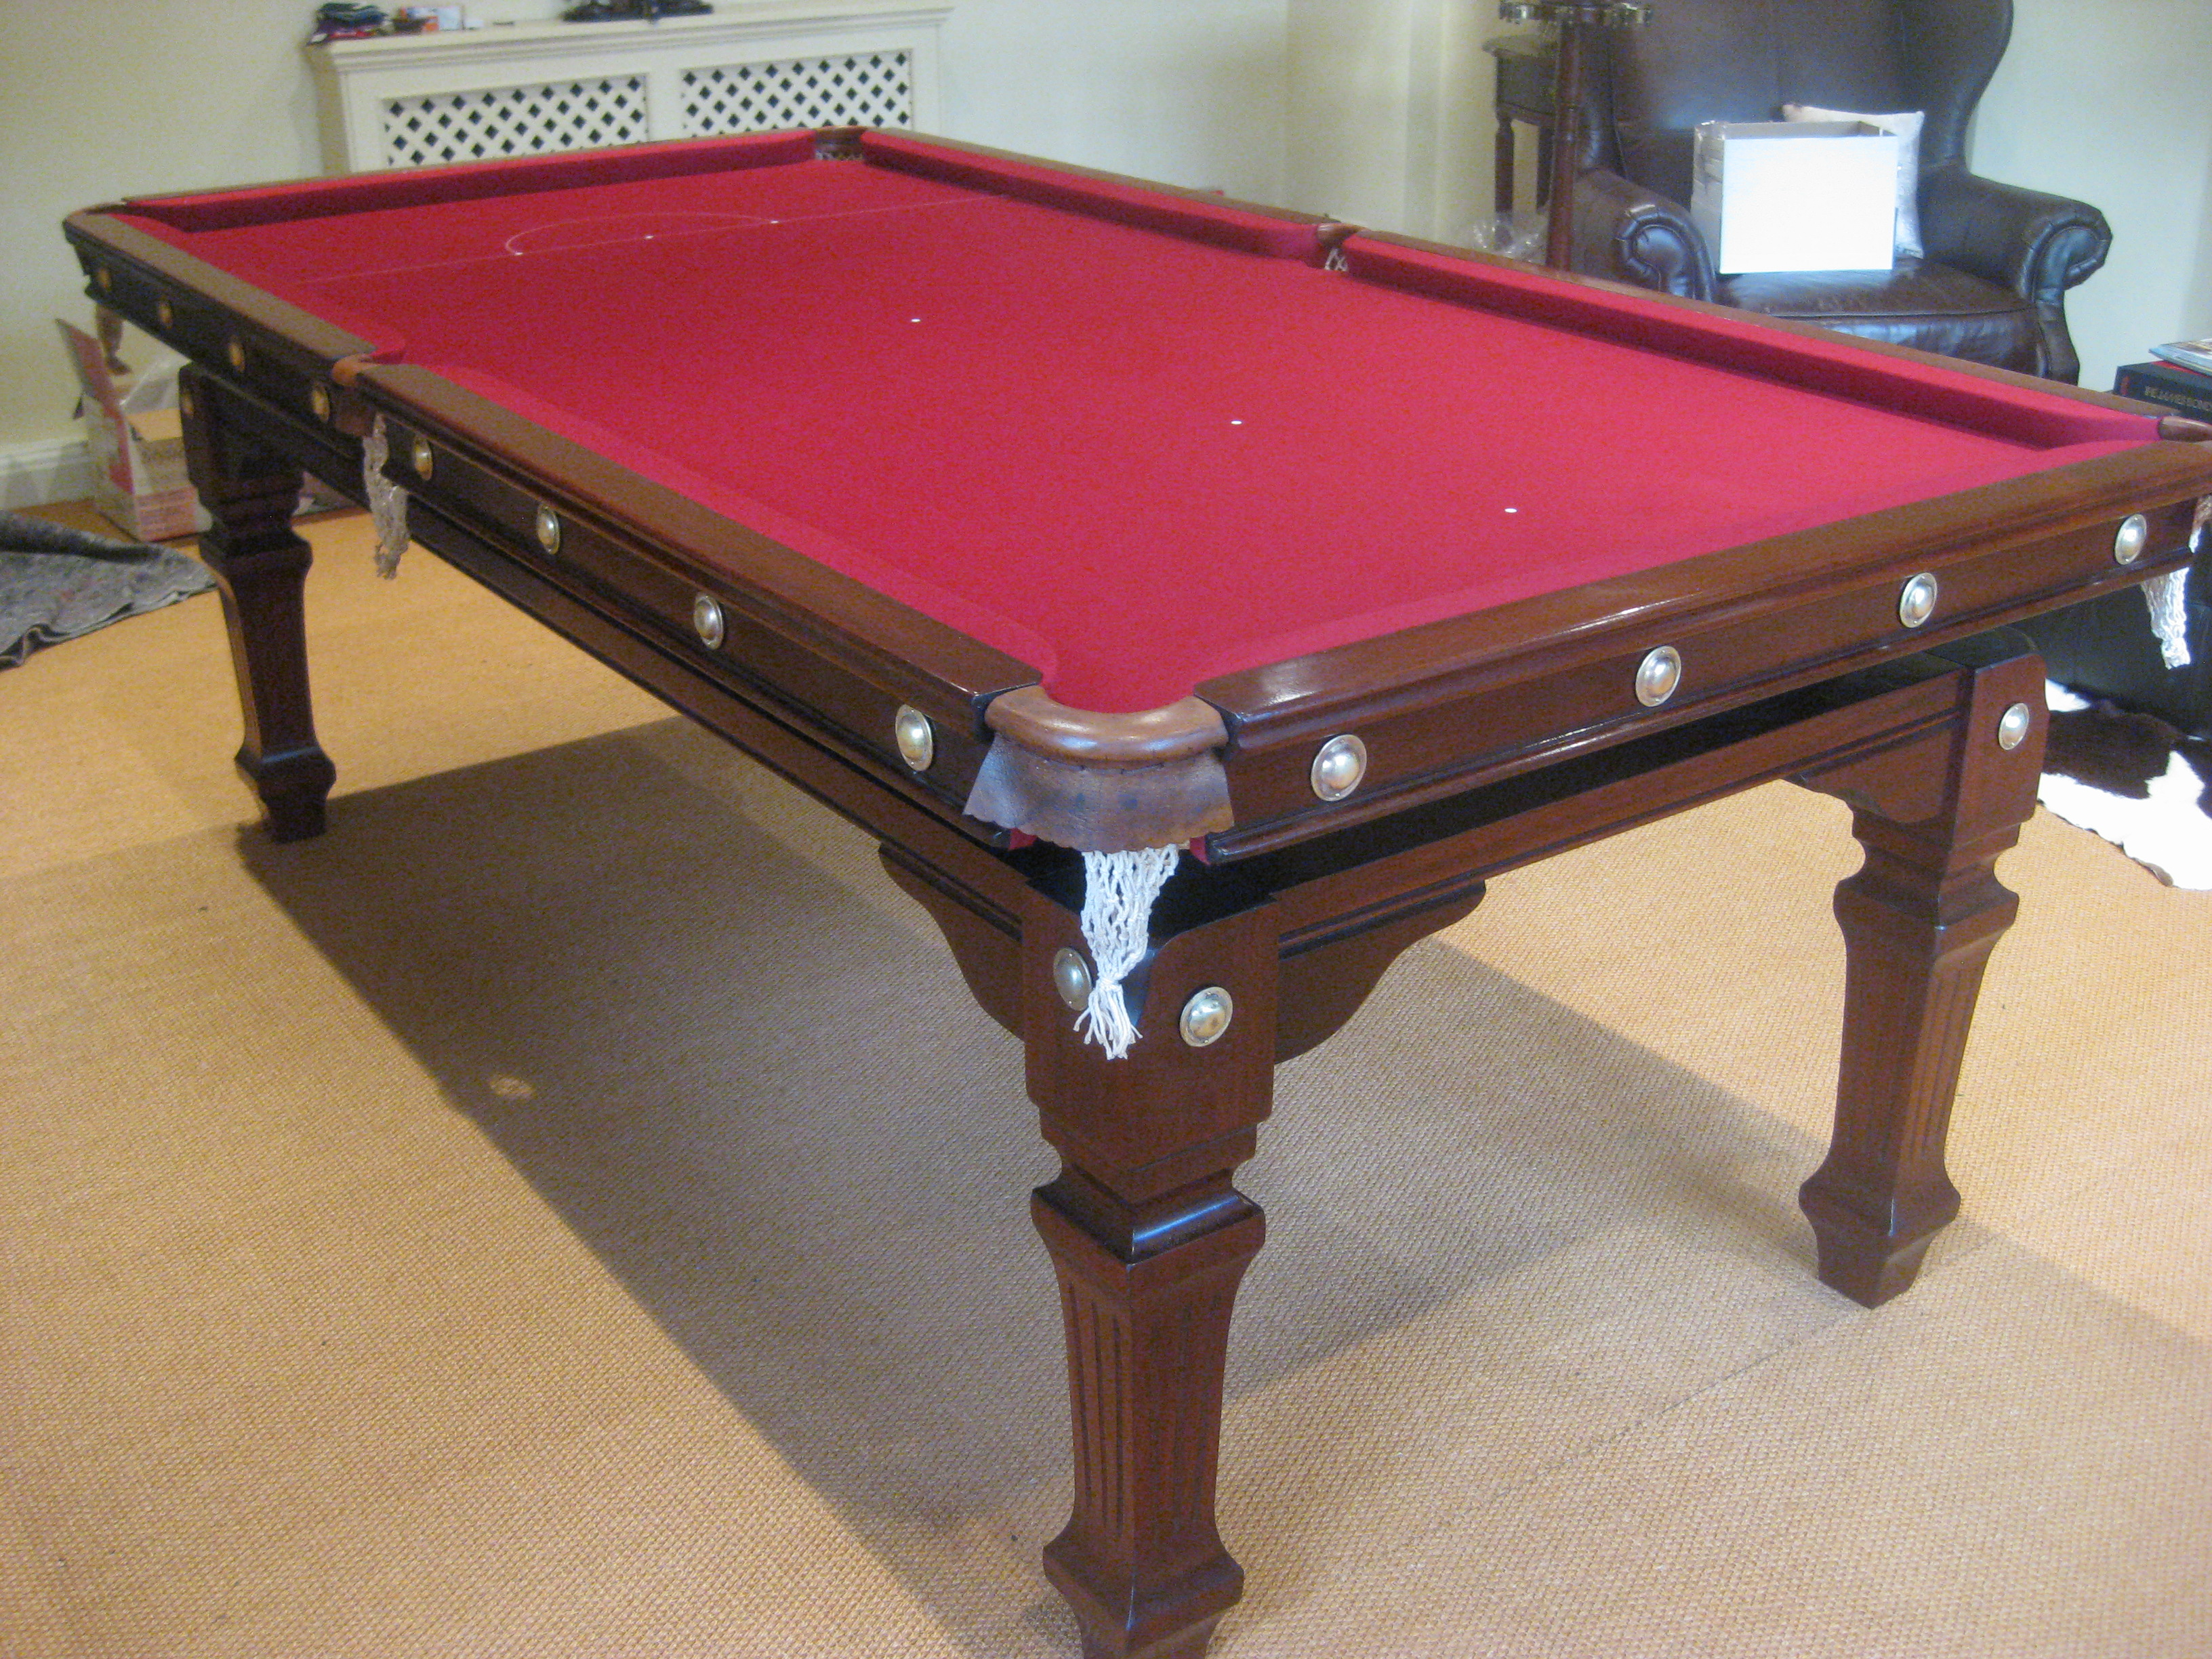 Antique Snooker Dining Tables Uk 7ft Mahogany Jelks Antique